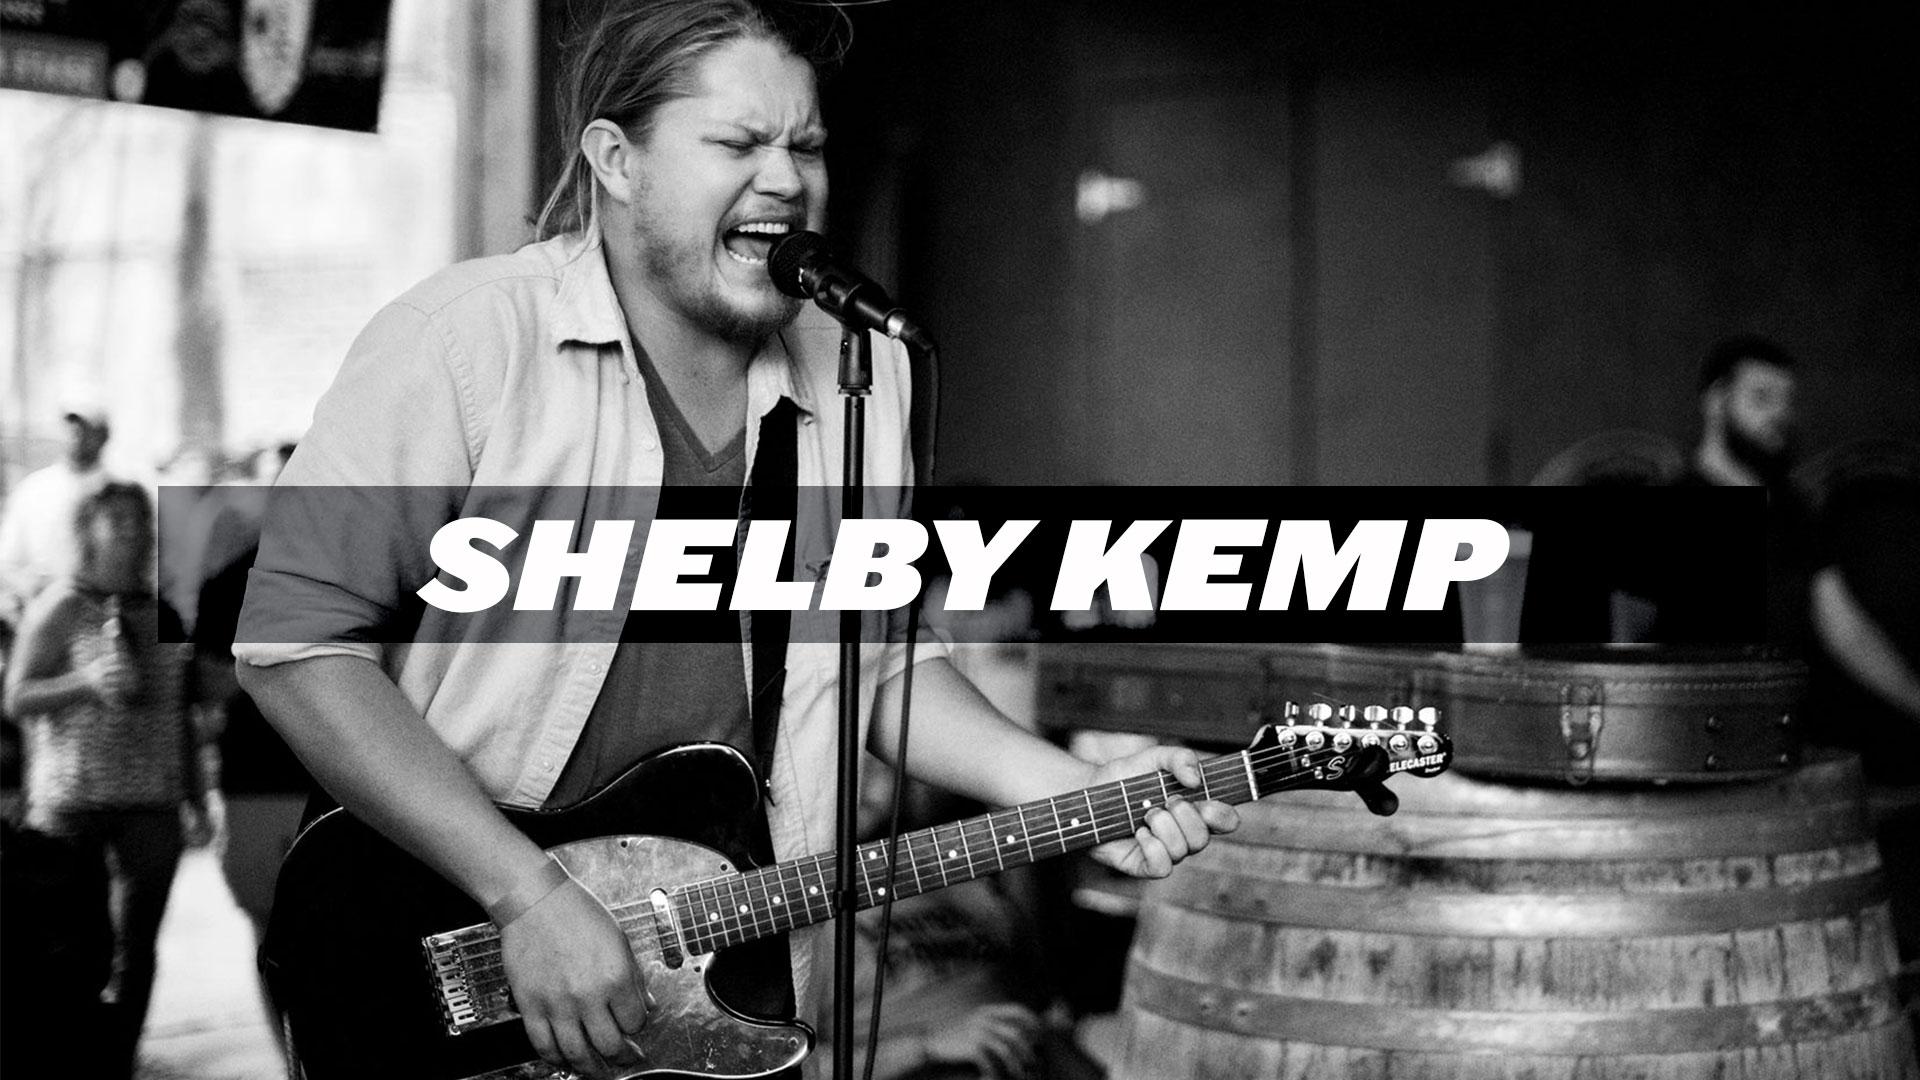 shelby-kemp.jpg